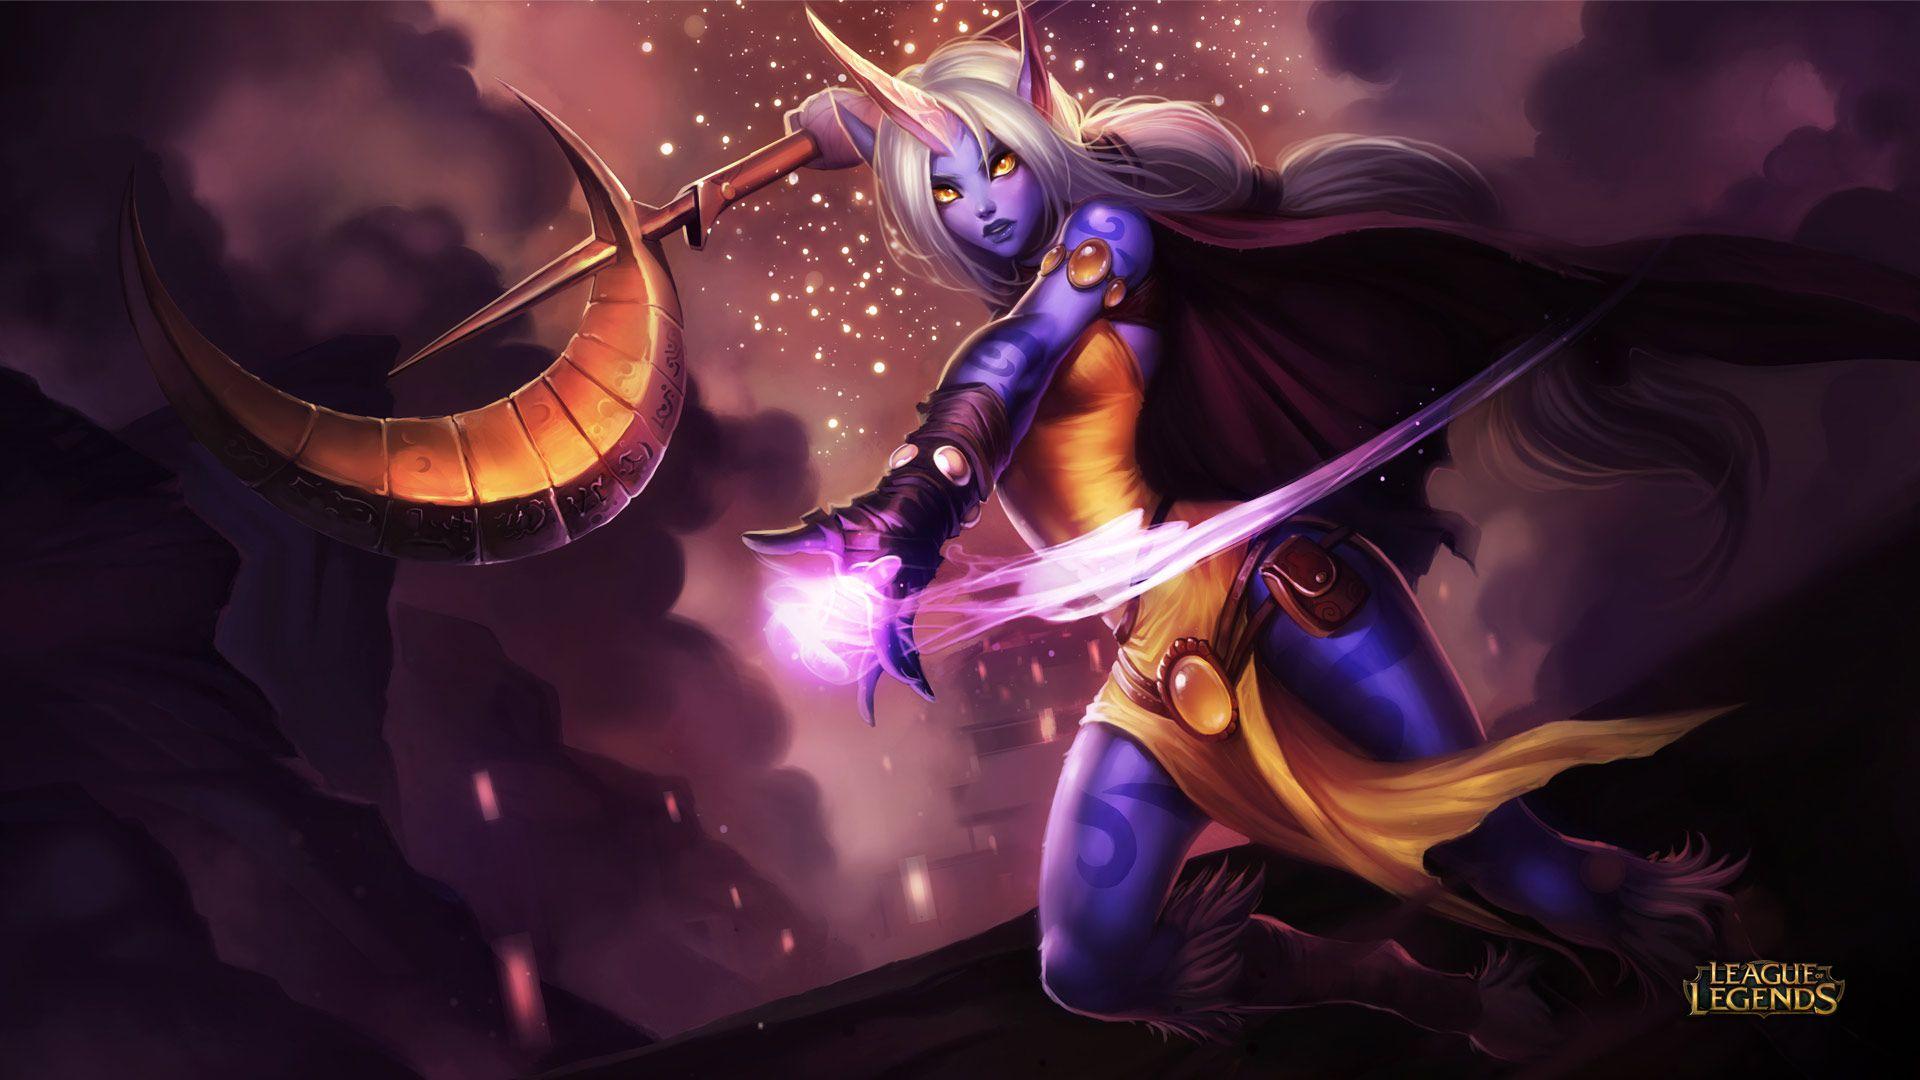 HD Soraka Wallpaper - League of Legends Wallpapers